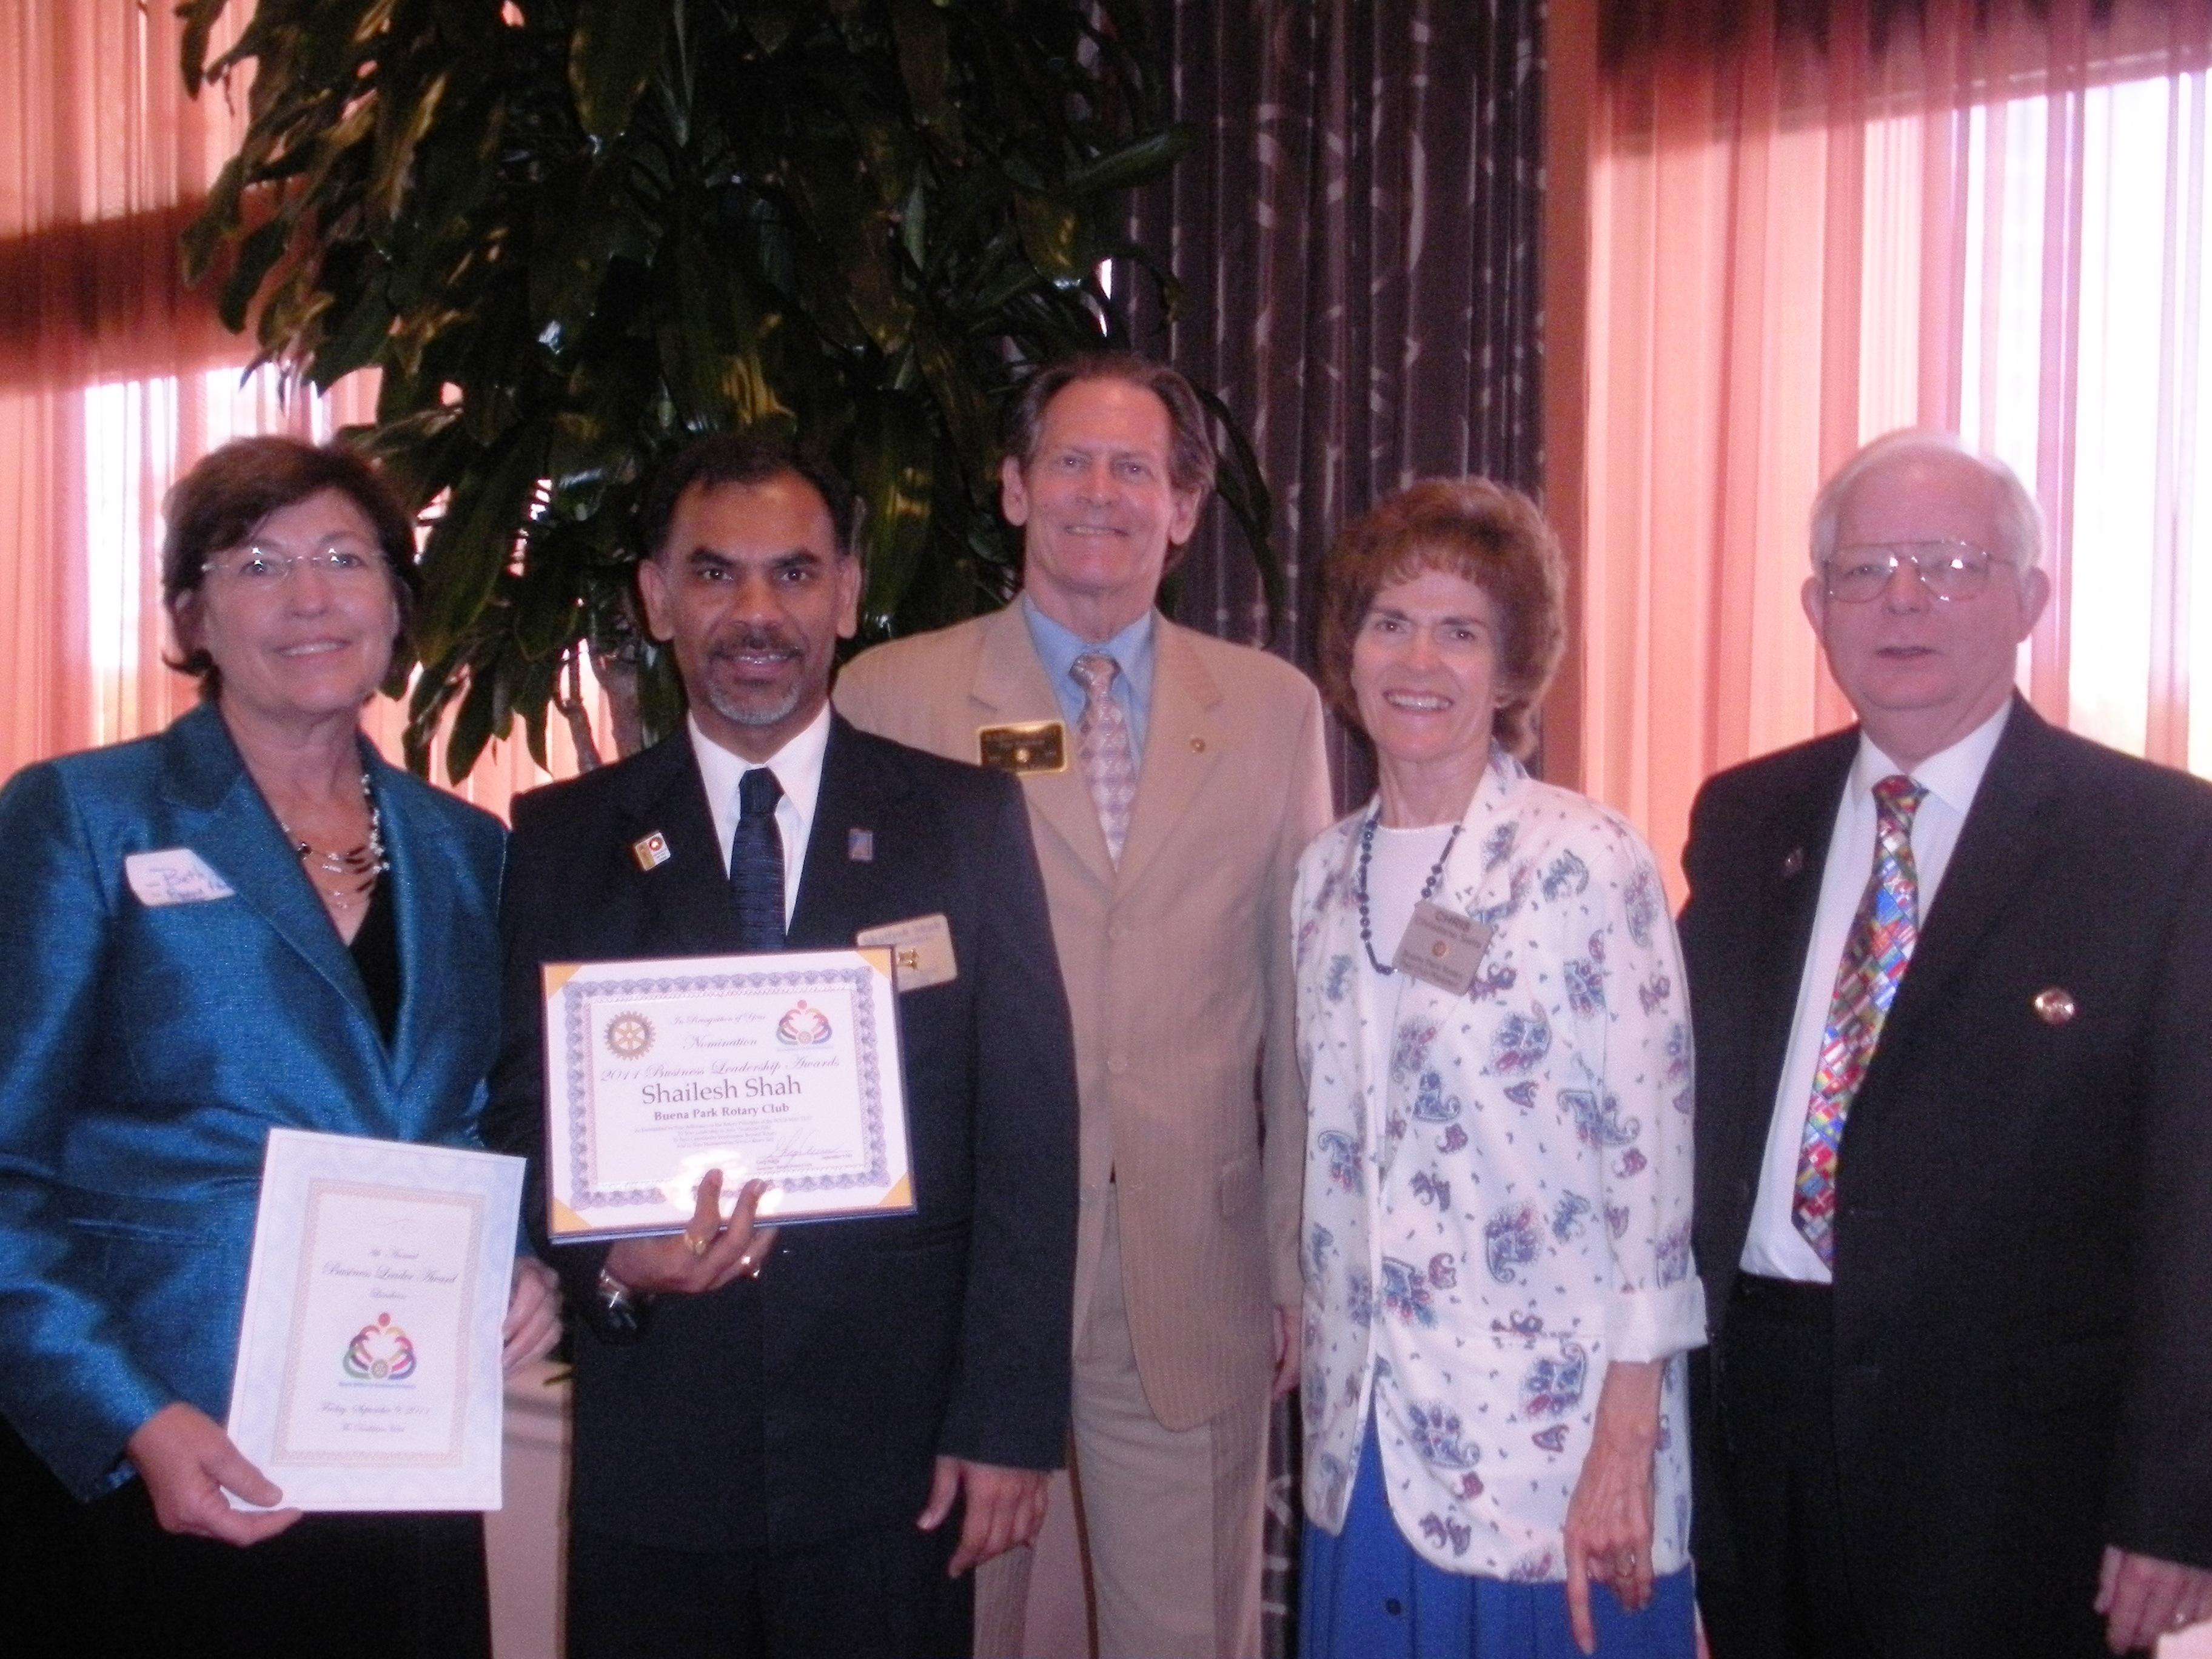 Beth Swift, Shailesh Shah Buena Park Rotarian of the year, Baron Night, Christiane and Dennis Salts.